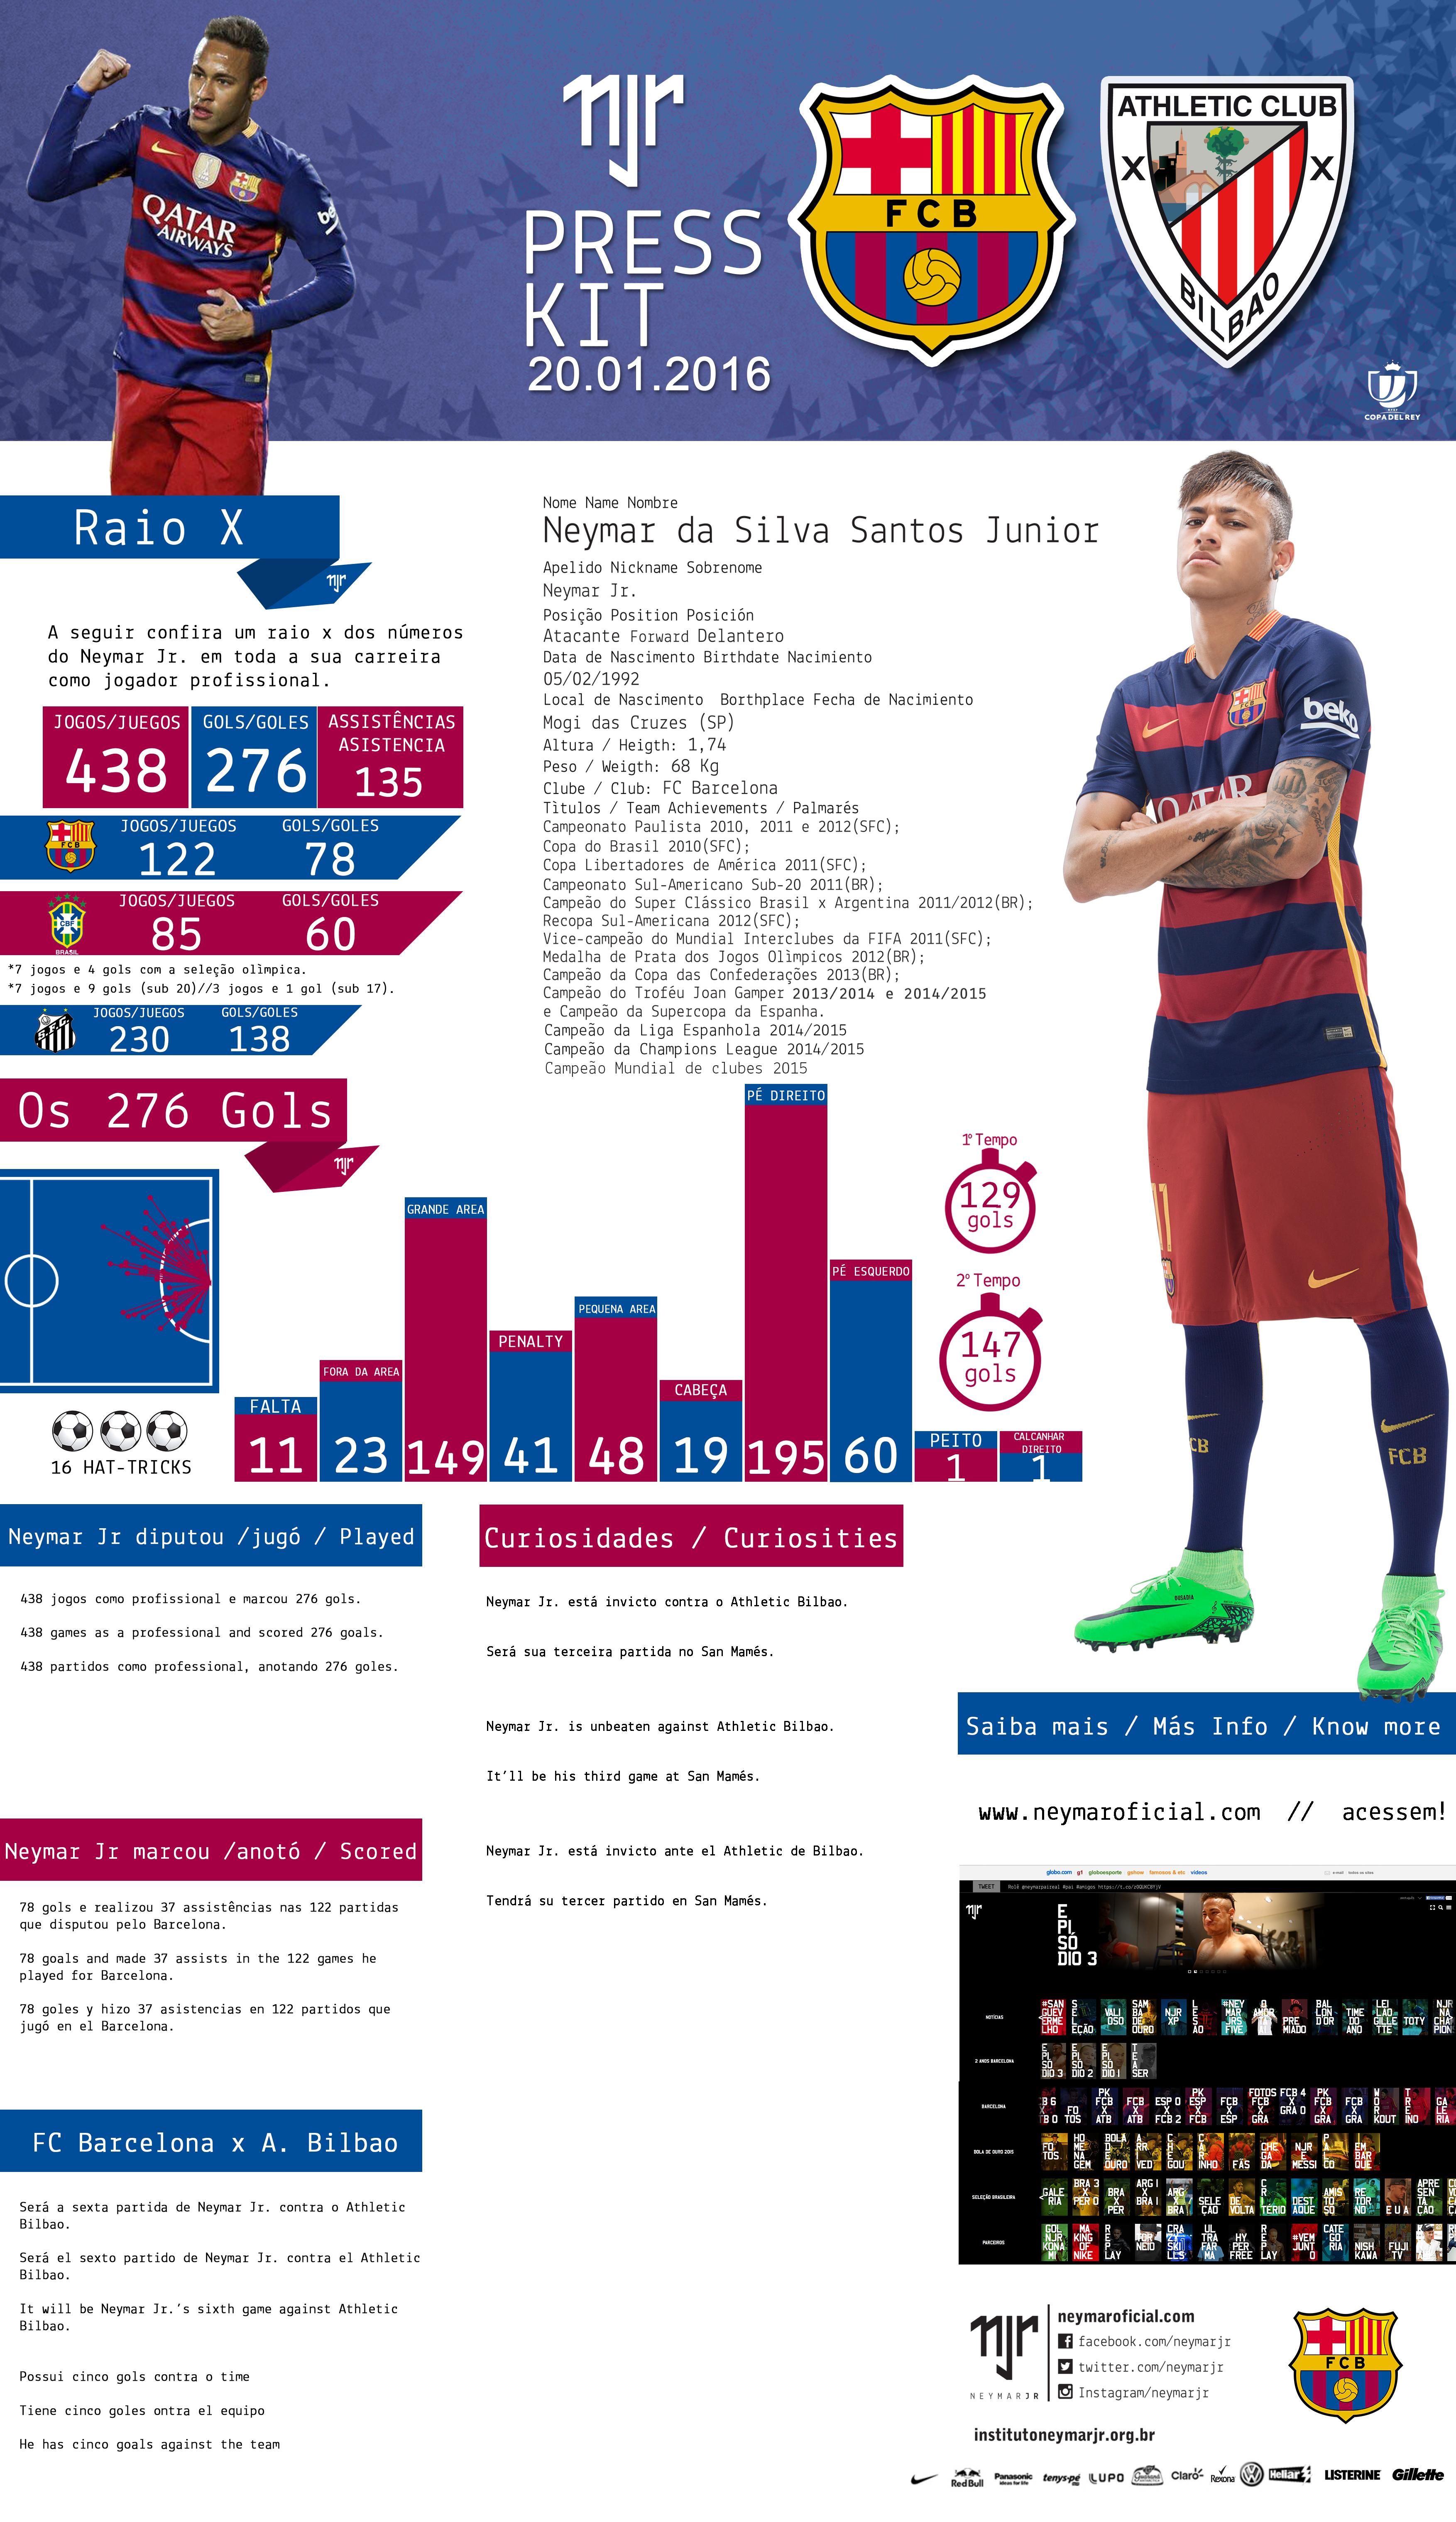 Press Kit - Neymar Jr - Athletic Club x FC Barcelona - Copa del Rey 039d368caebea